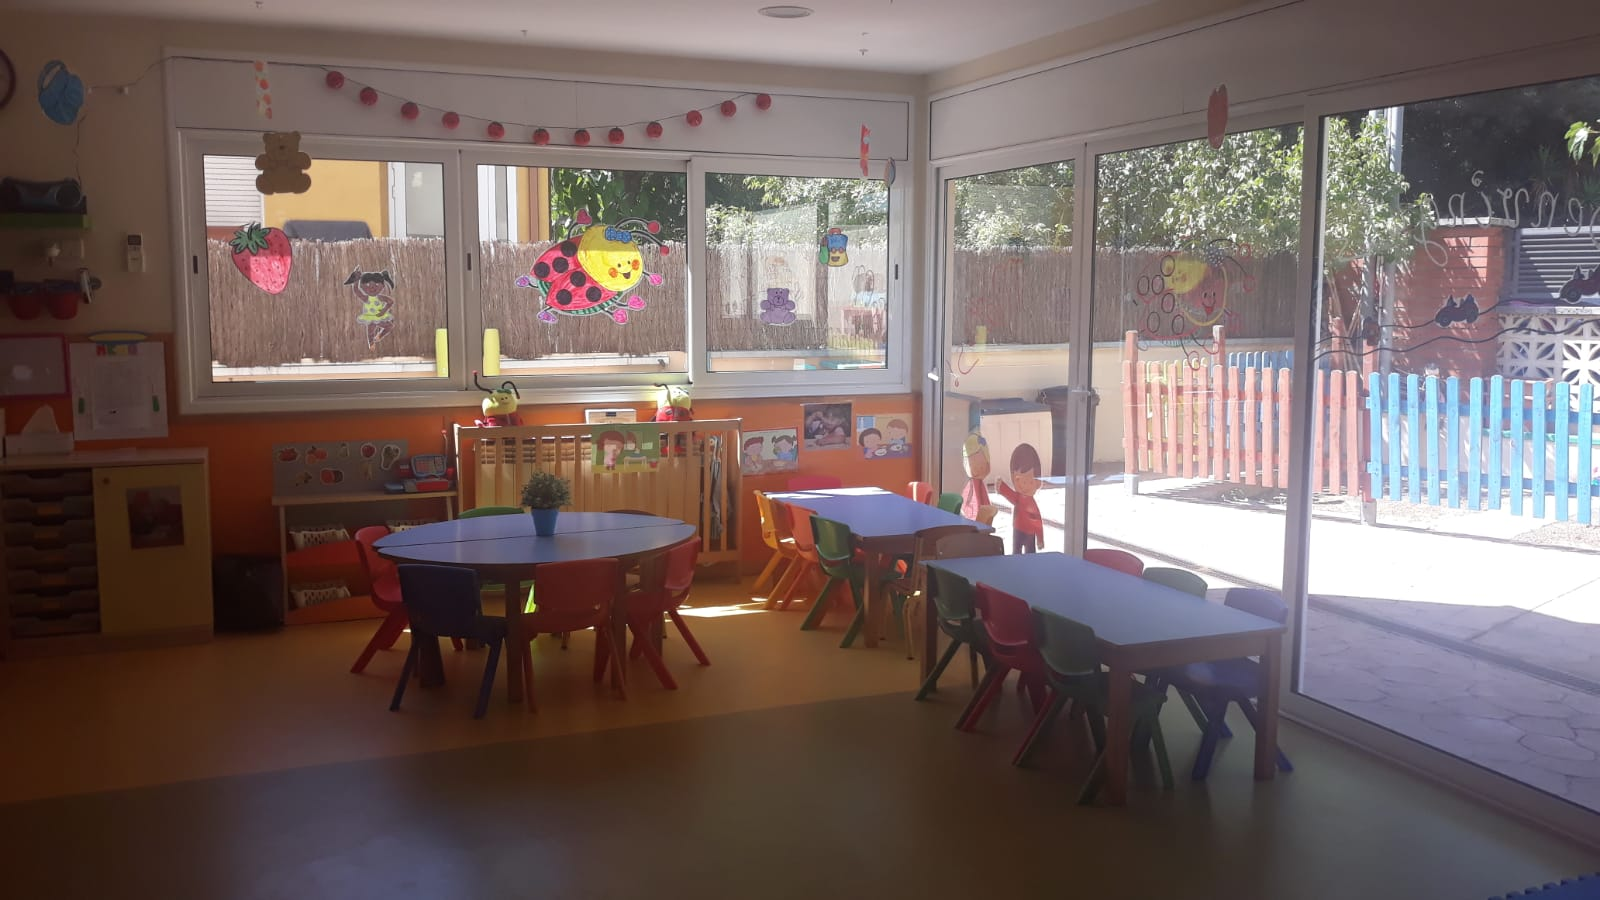 Aula escola bressol Mirasolet. FOTO: Cedida